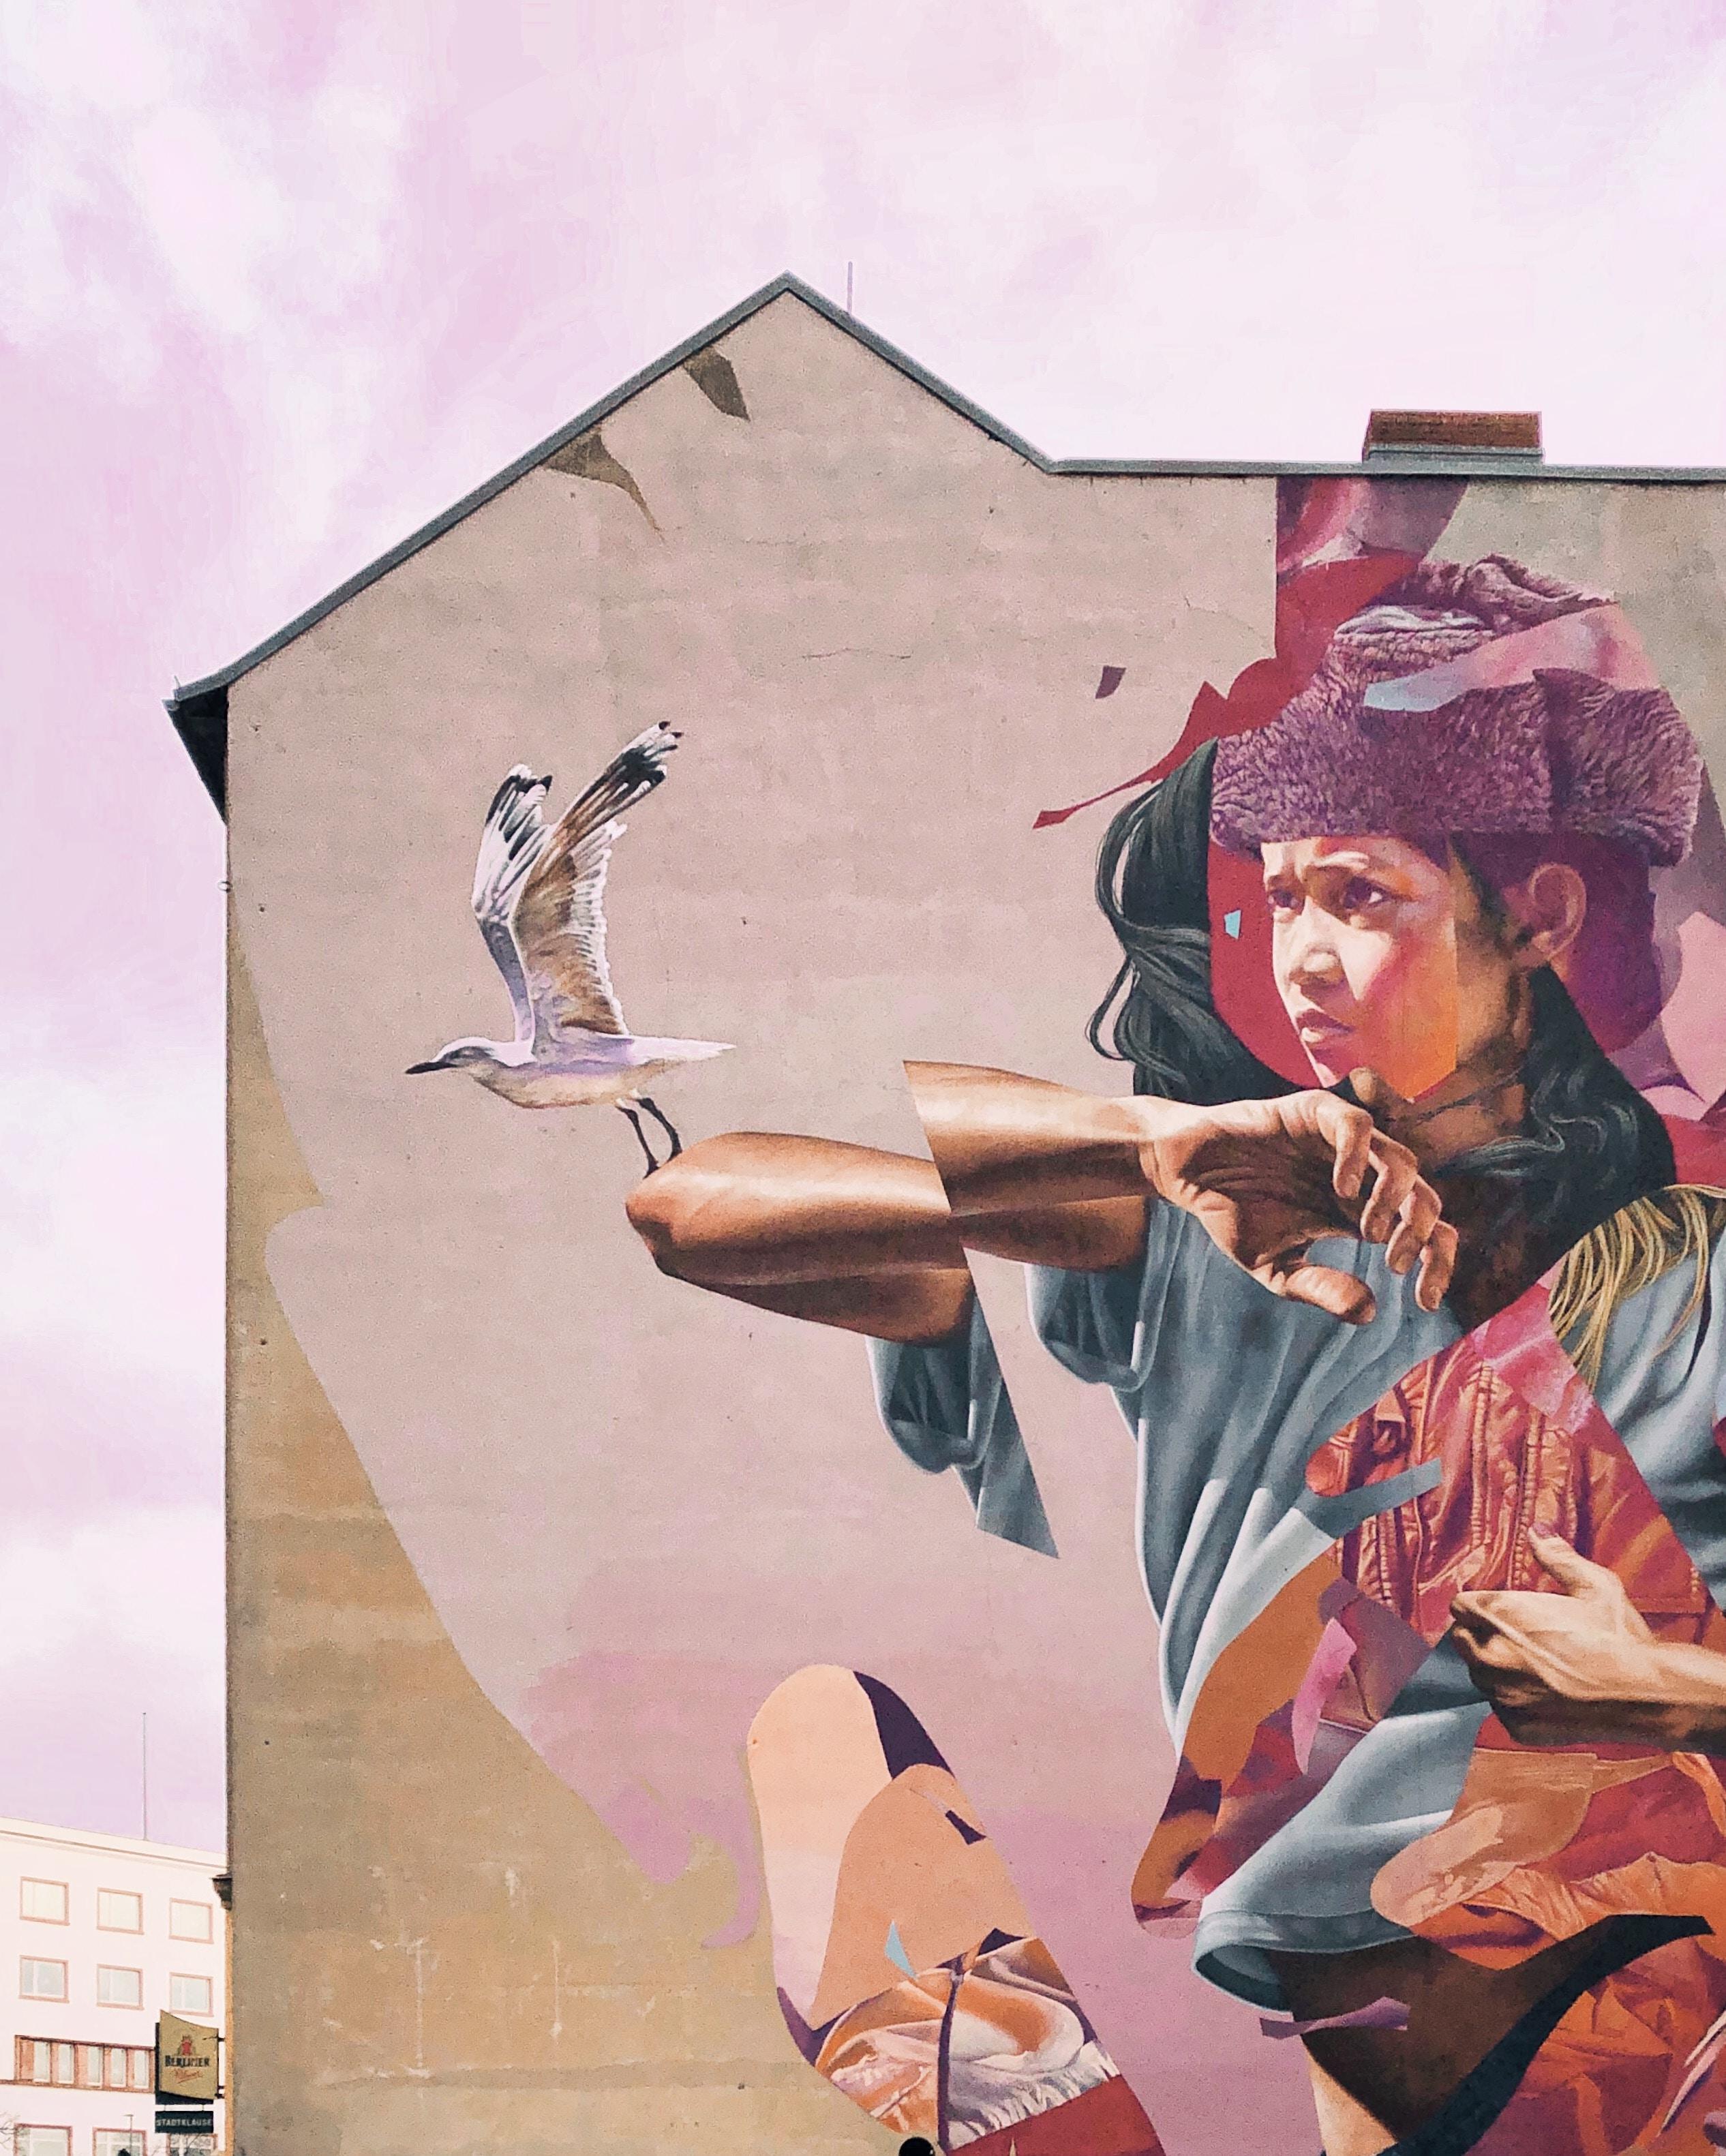 bird perch on boy's arm building graffiti